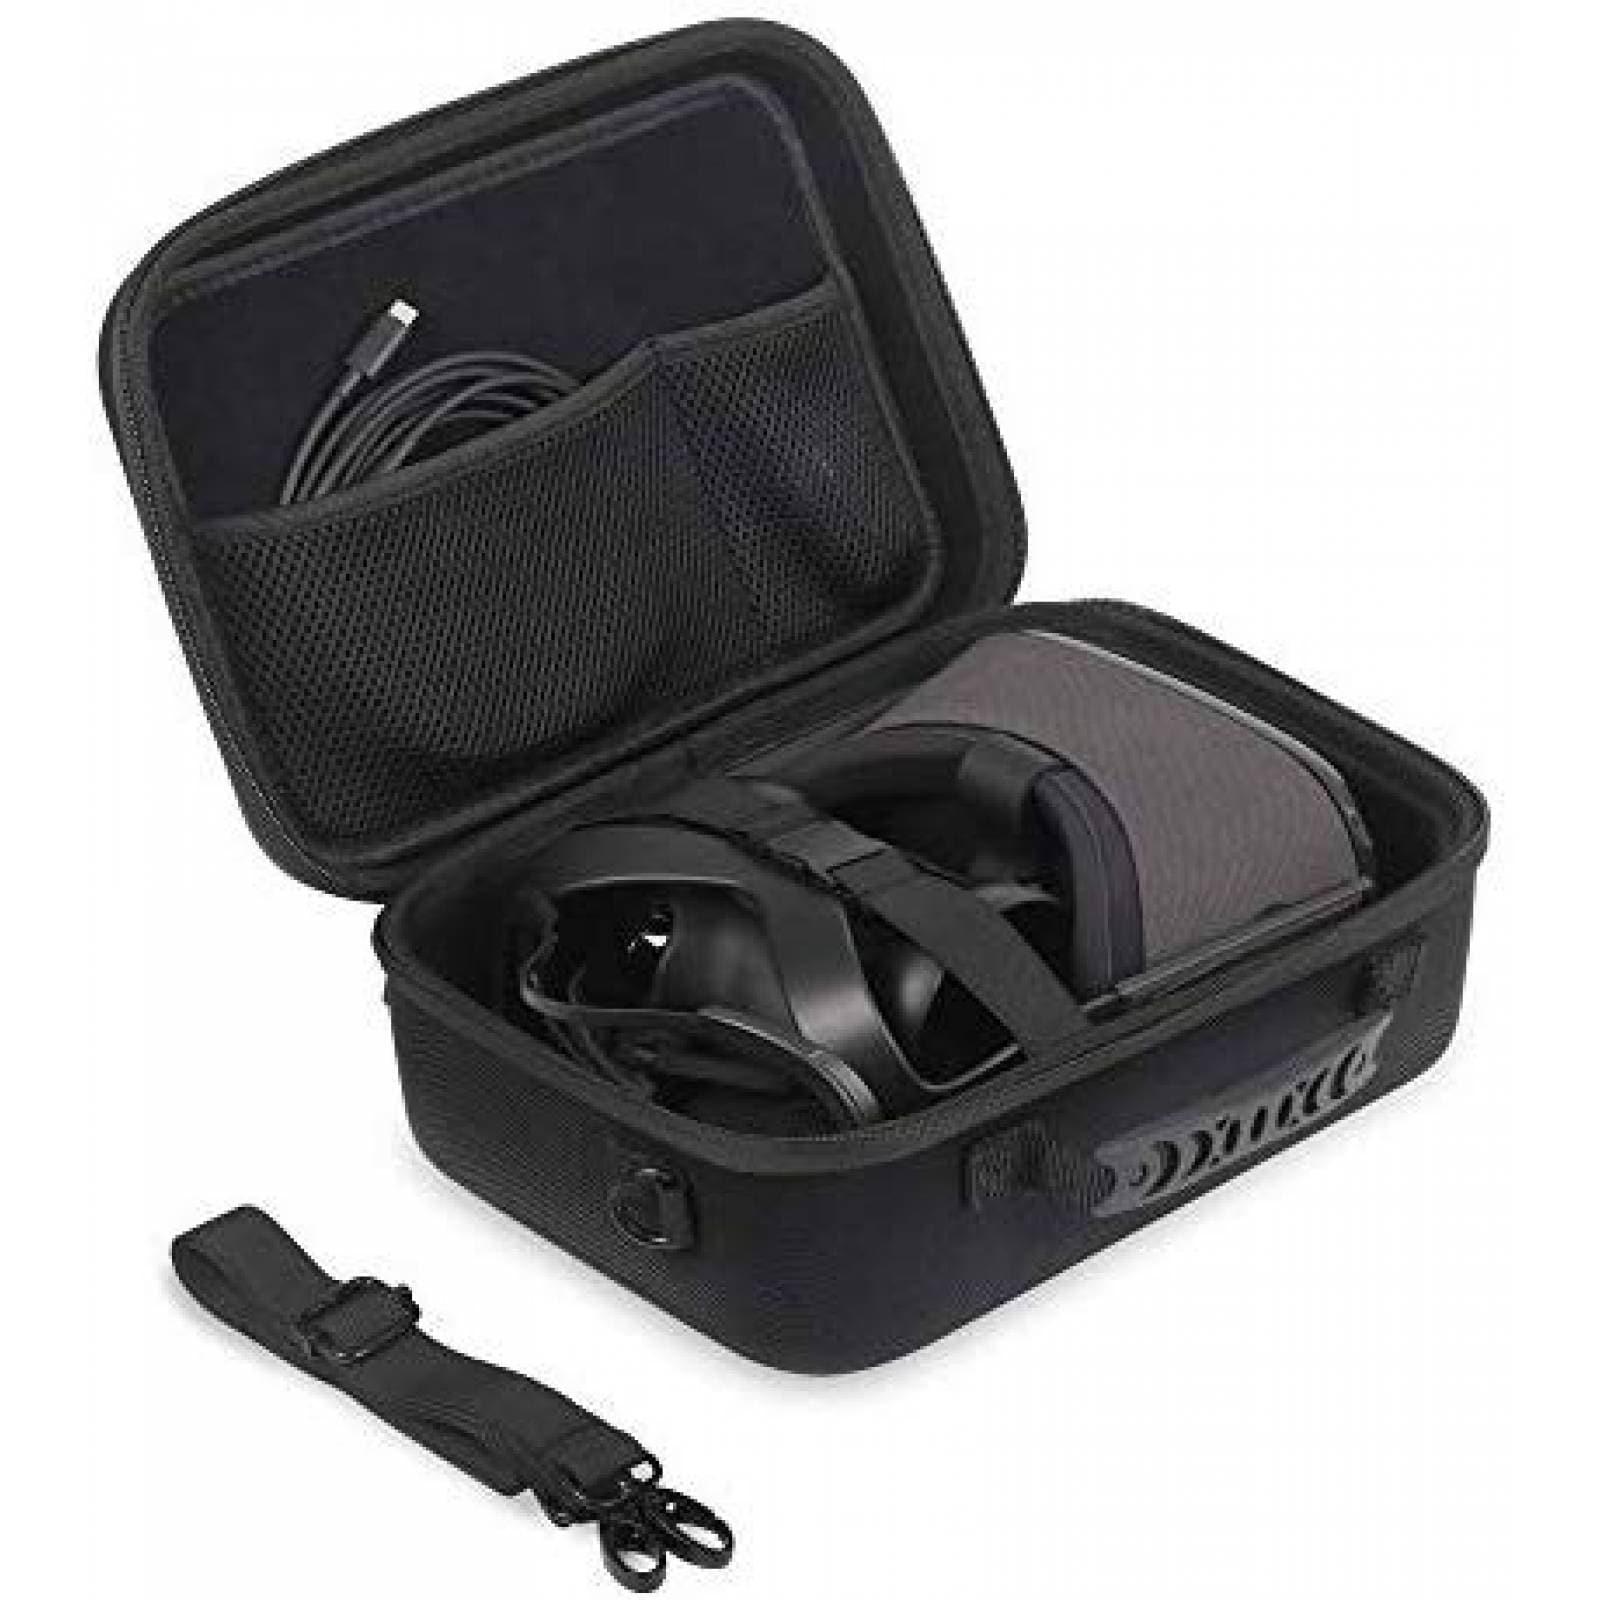 Carcasa Rígida JSVER VC0311 para Juegos de VR -Negro